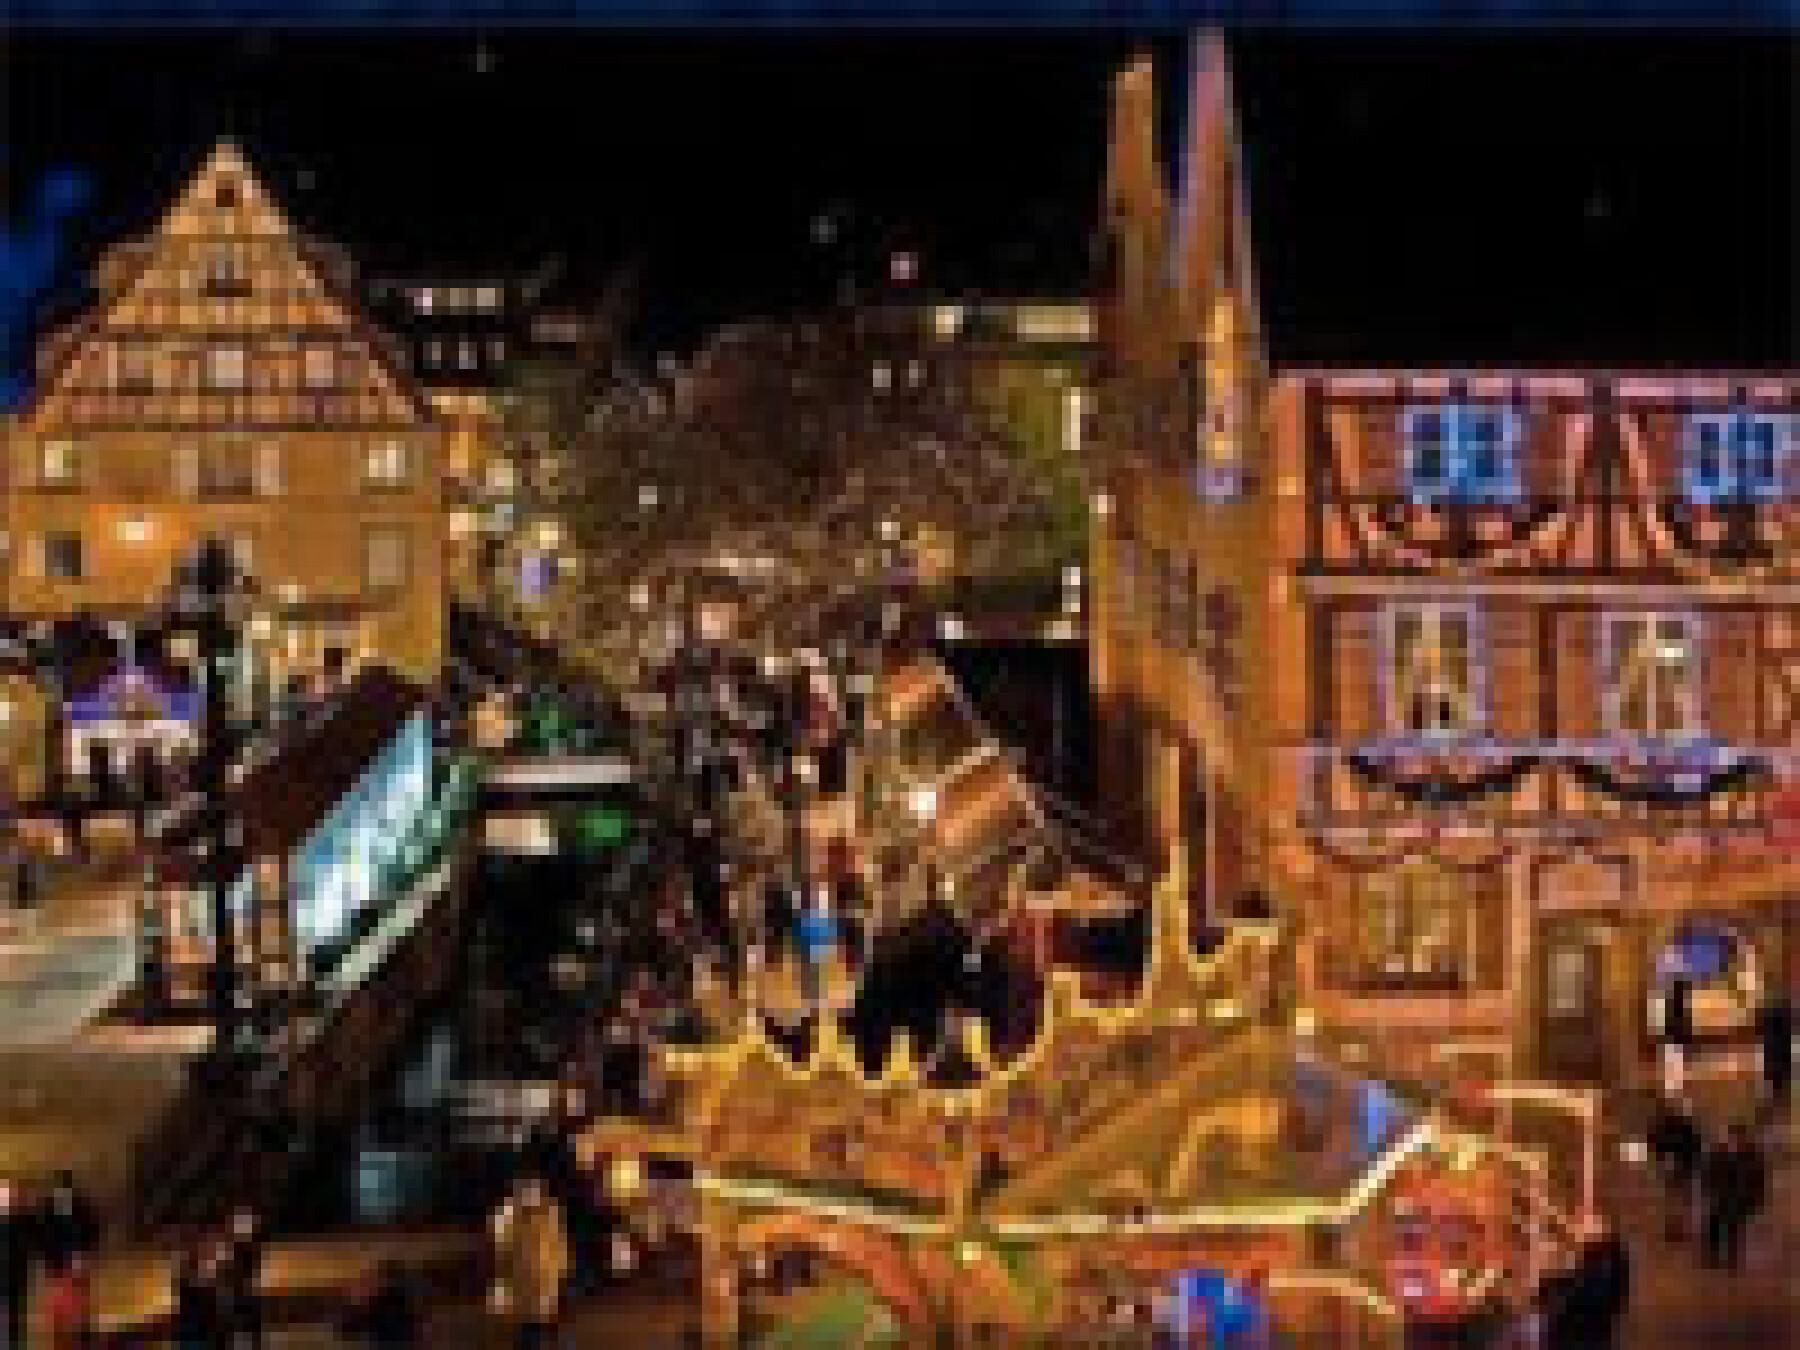 Marchés de Noël de Colmar